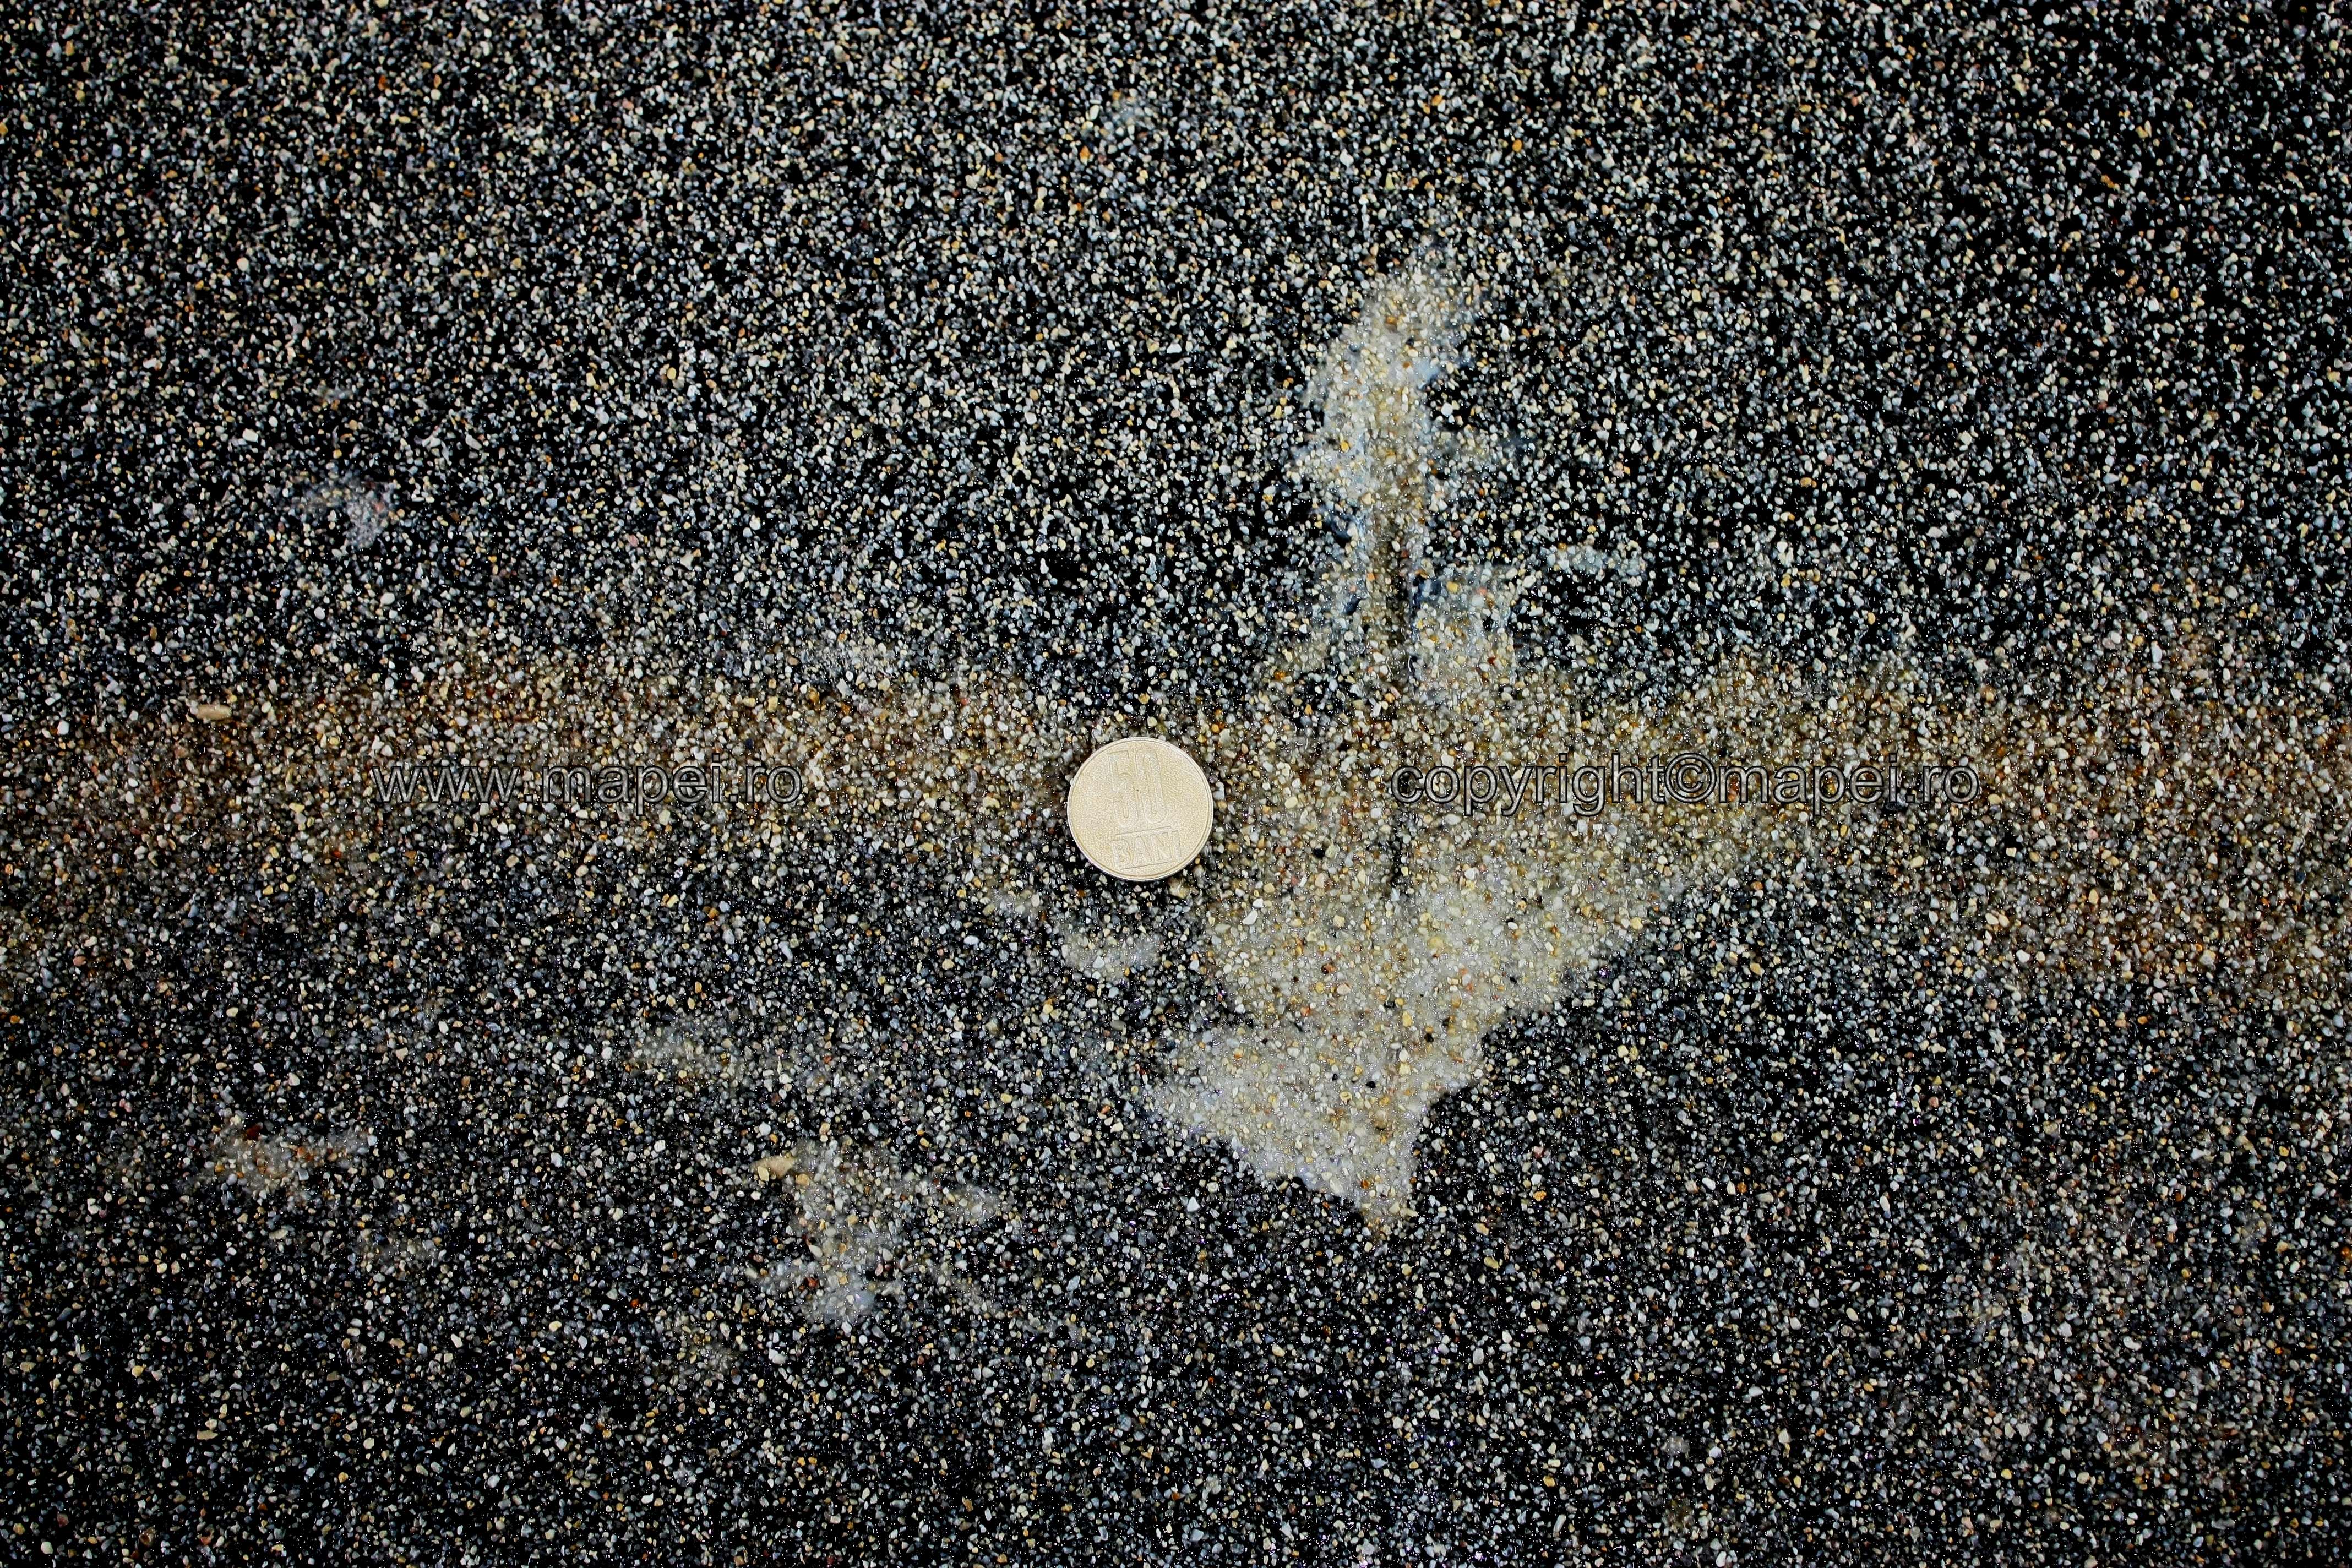 foto 18 - detaliu reparatie si strat epoxi rugos - Galerie 10